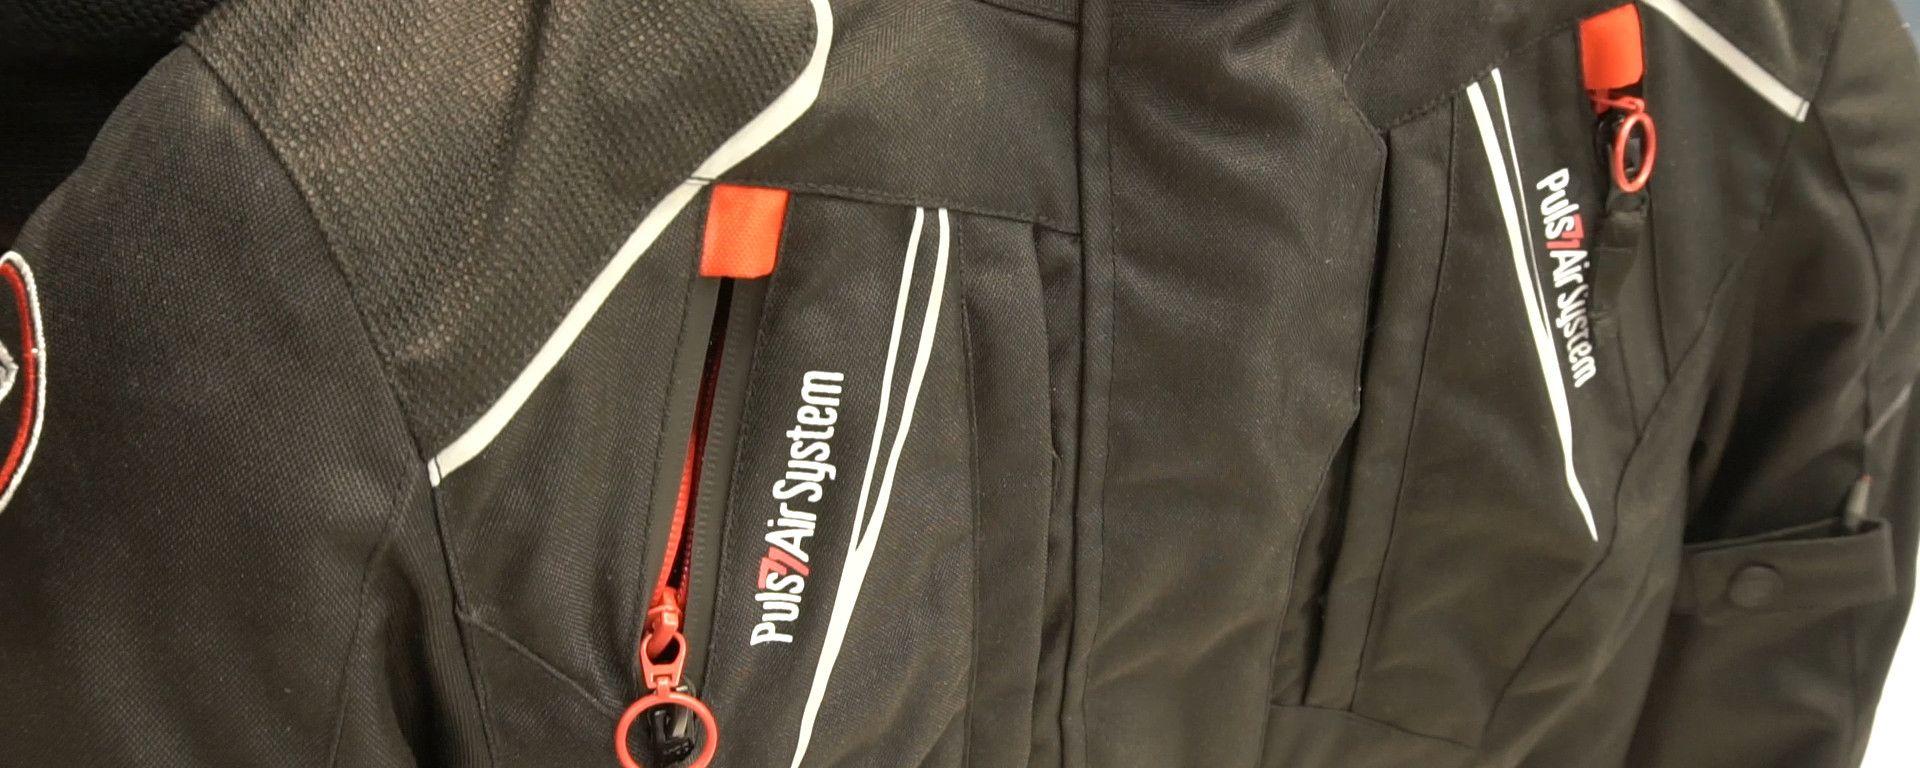 Bering: a Eicma 2019 presenta le giacche Oural e Lady Oural